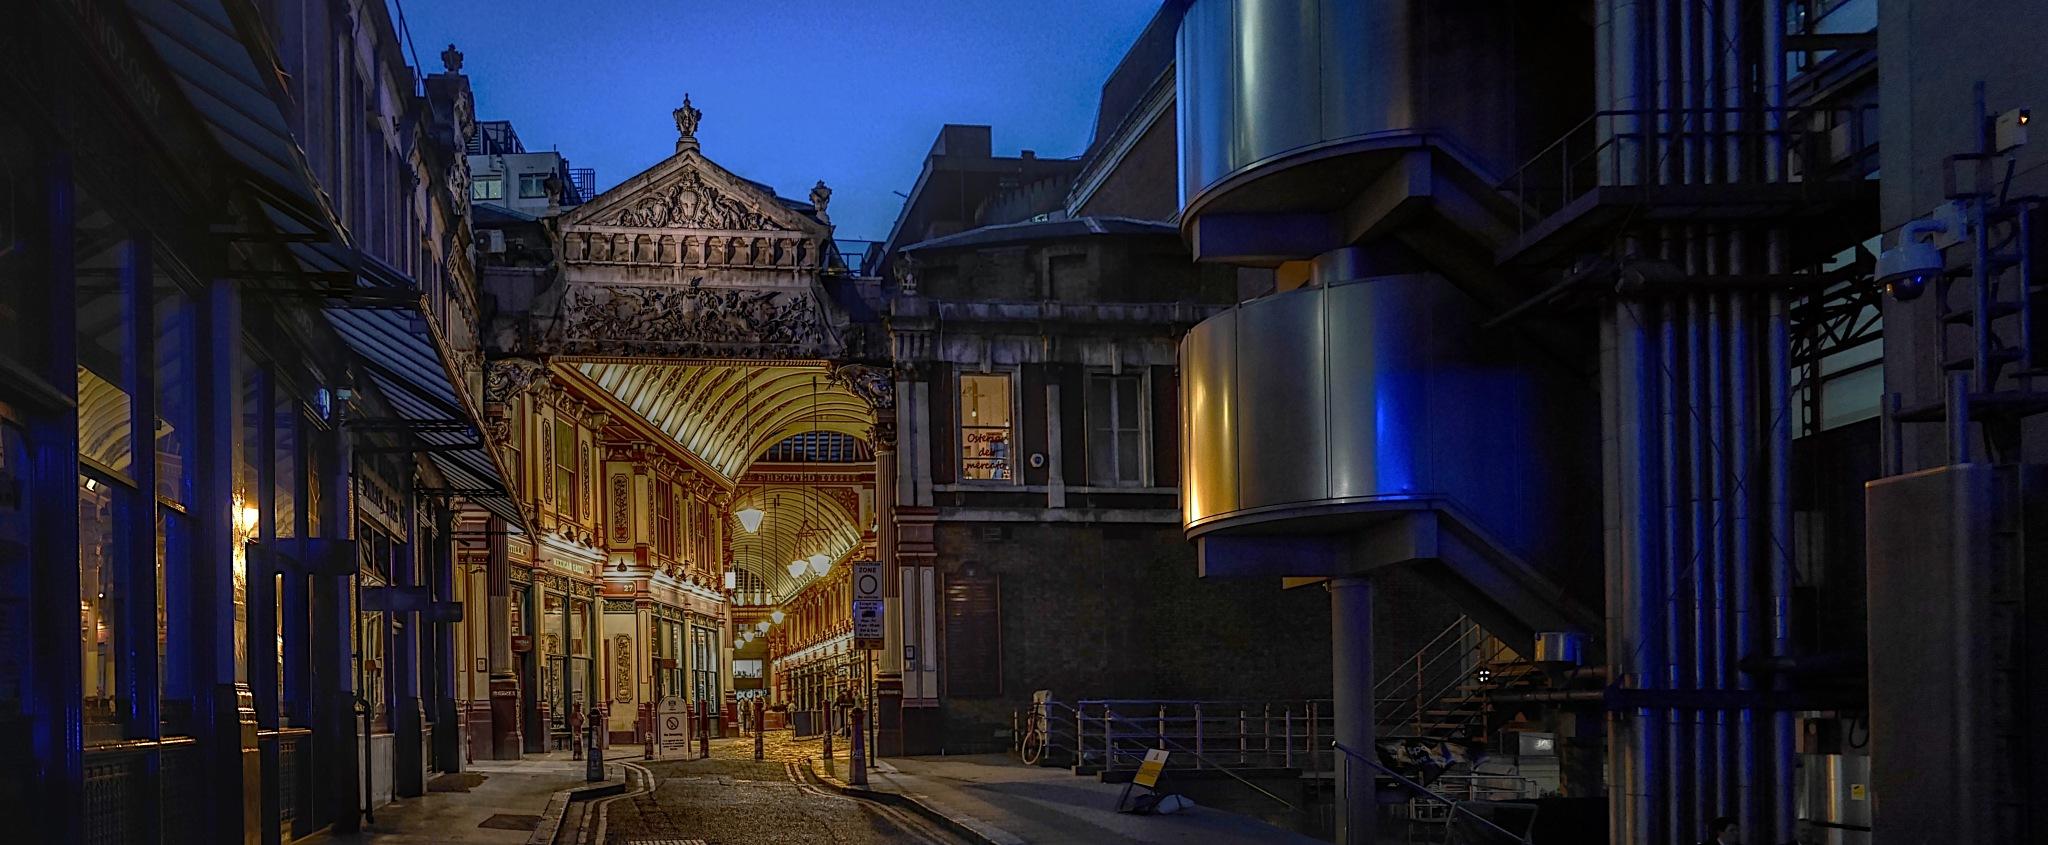 Lloyds of Rework of London building leading into Leadenhall Market by Steven Best